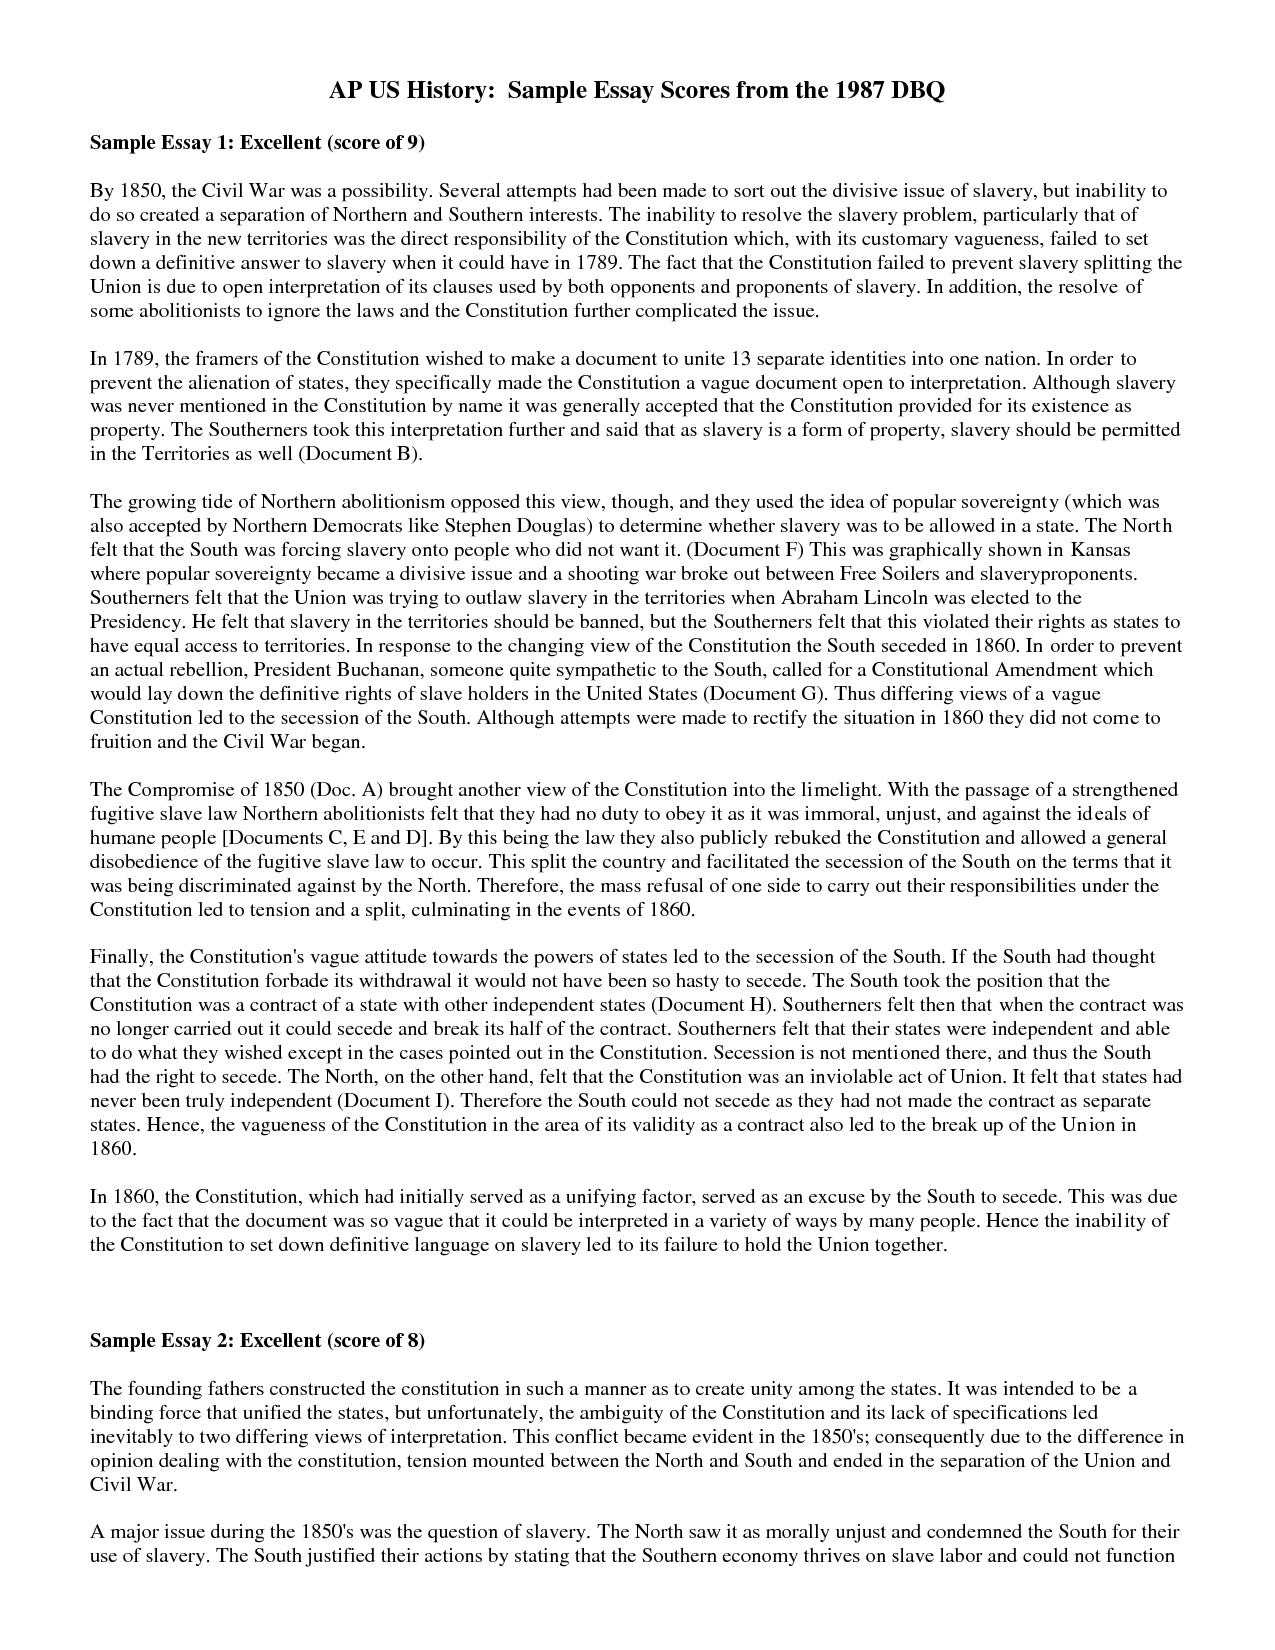 002 Ybw4oskdzu Essay Example Sample Magnificent Dbq 5th Grade Ap Euro Global History Full